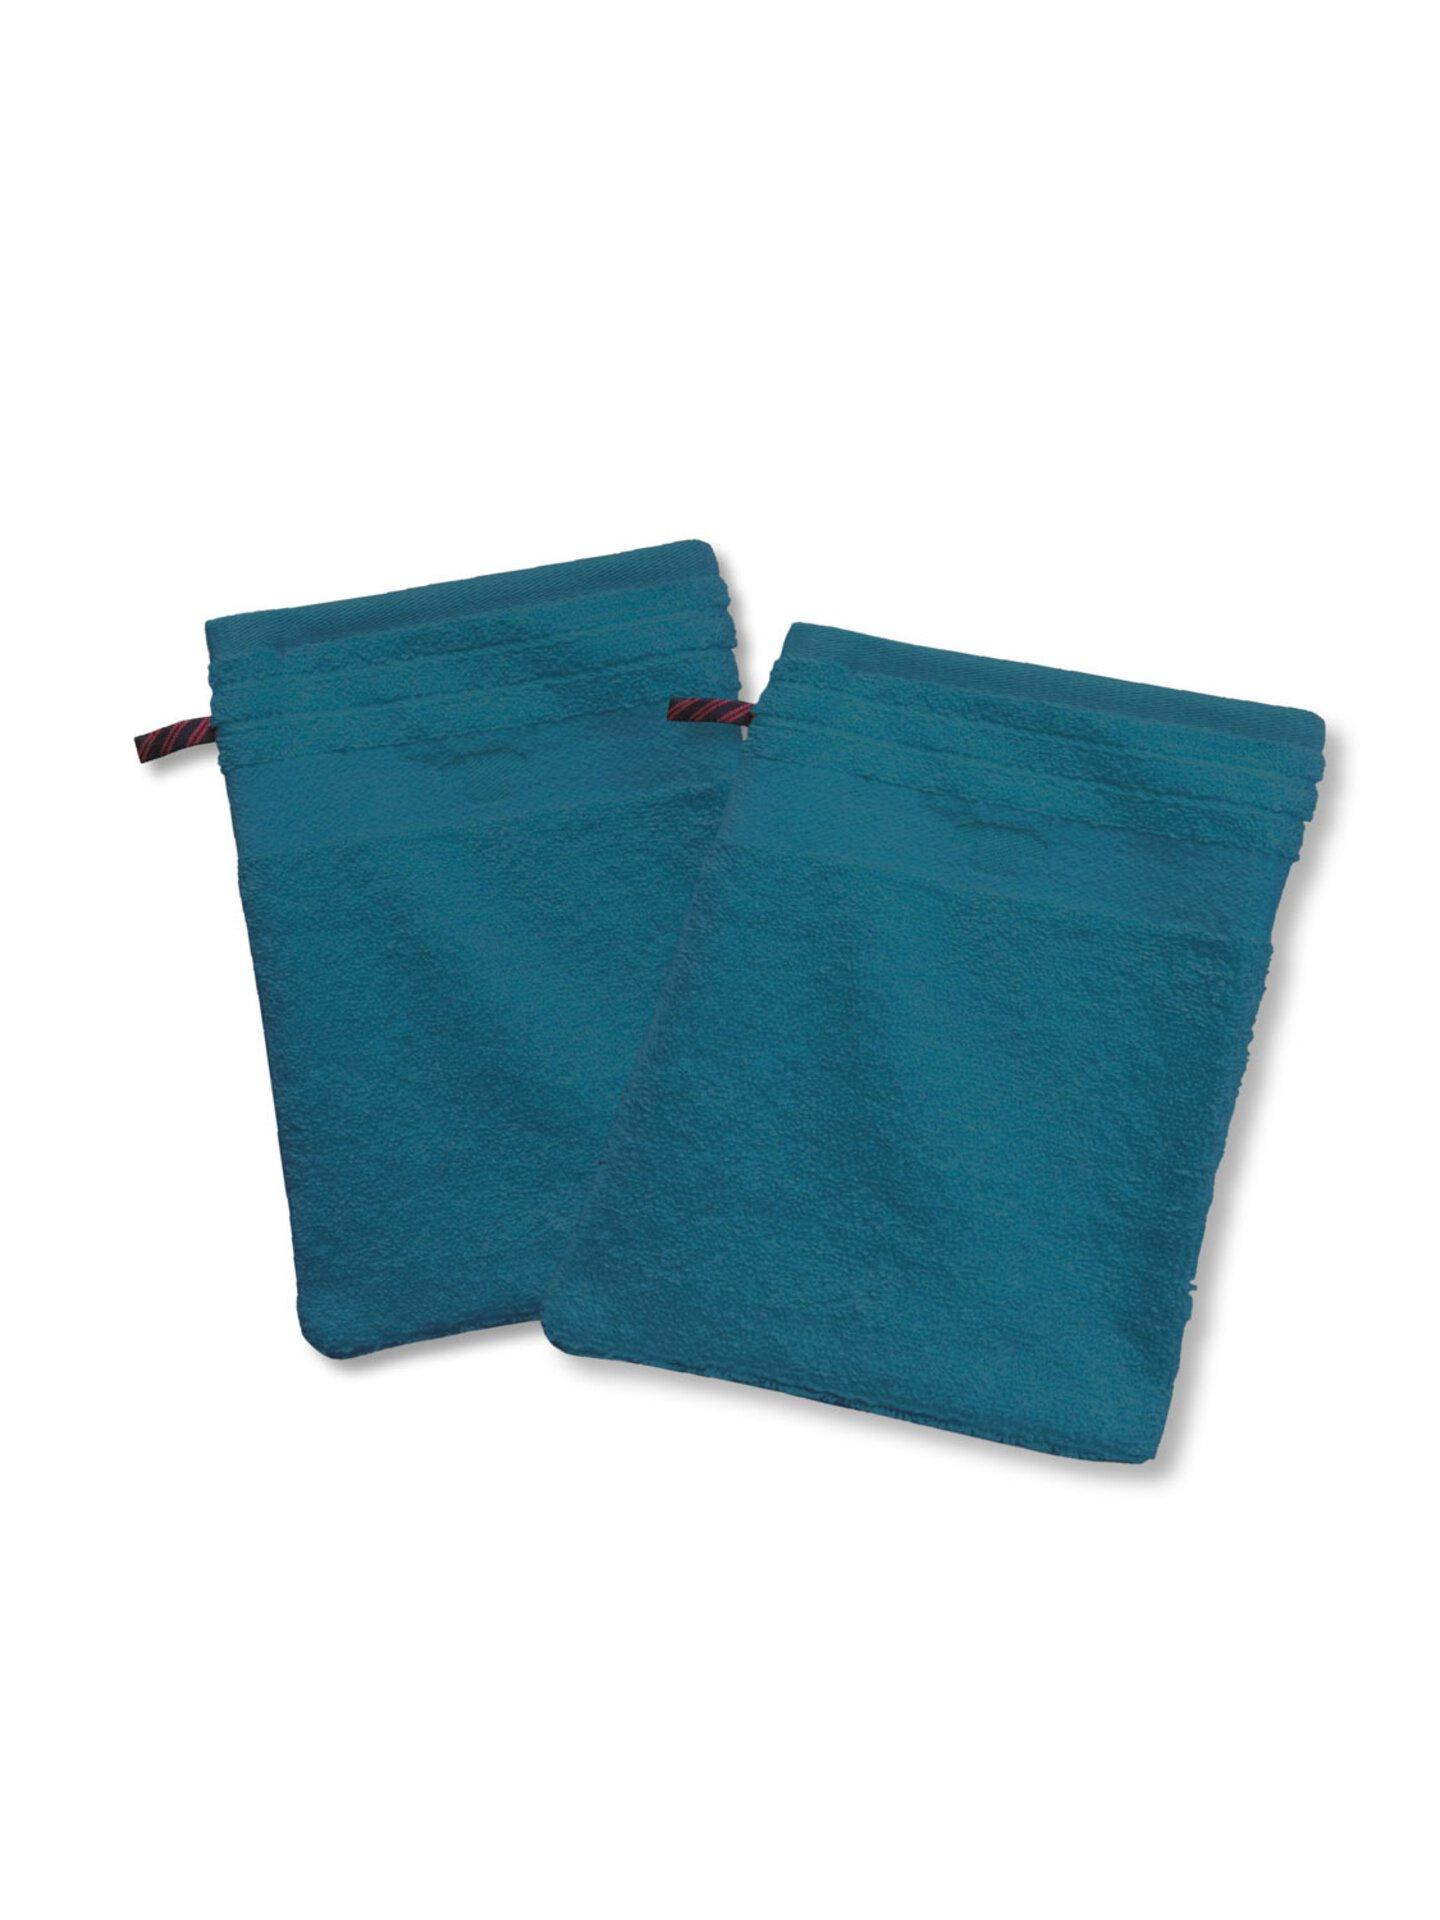 Waschhandschuh Uni Towel Tom Tailor Textil Blau 16 x 22 cm